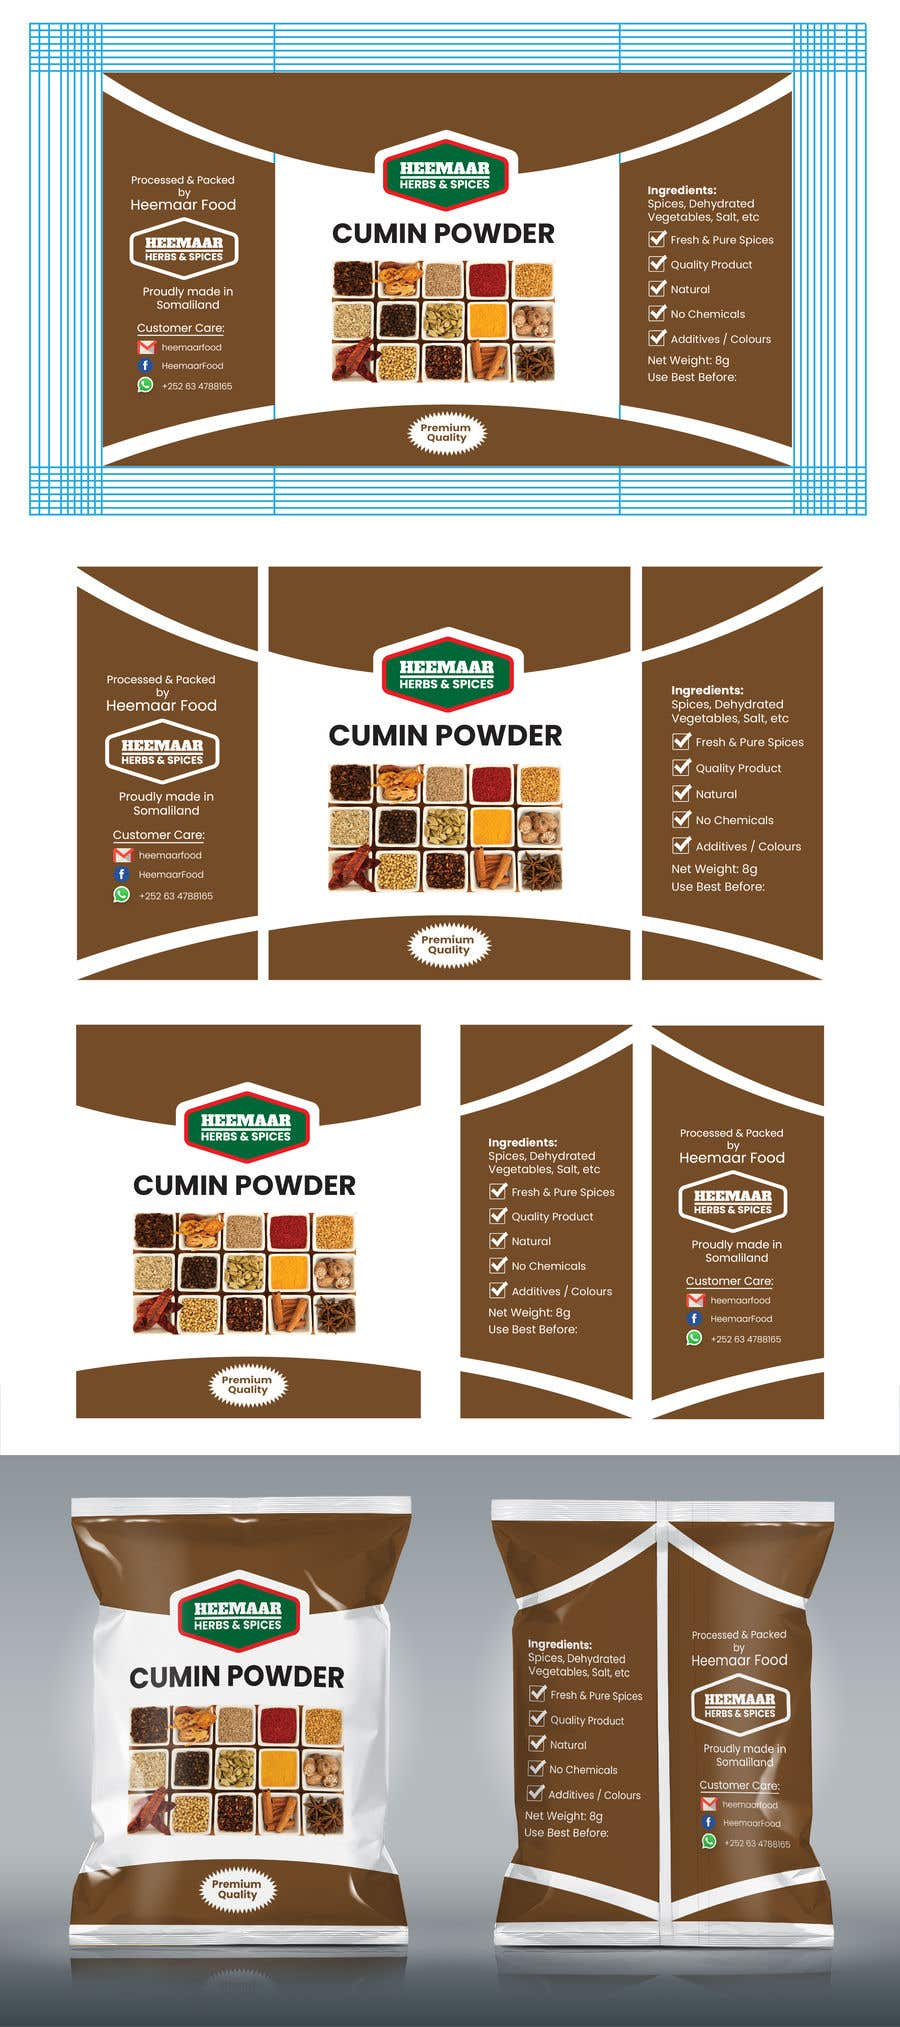 Konkurrenceindlæg #                                        21                                      for                                         Spice Pouch Packaging Design